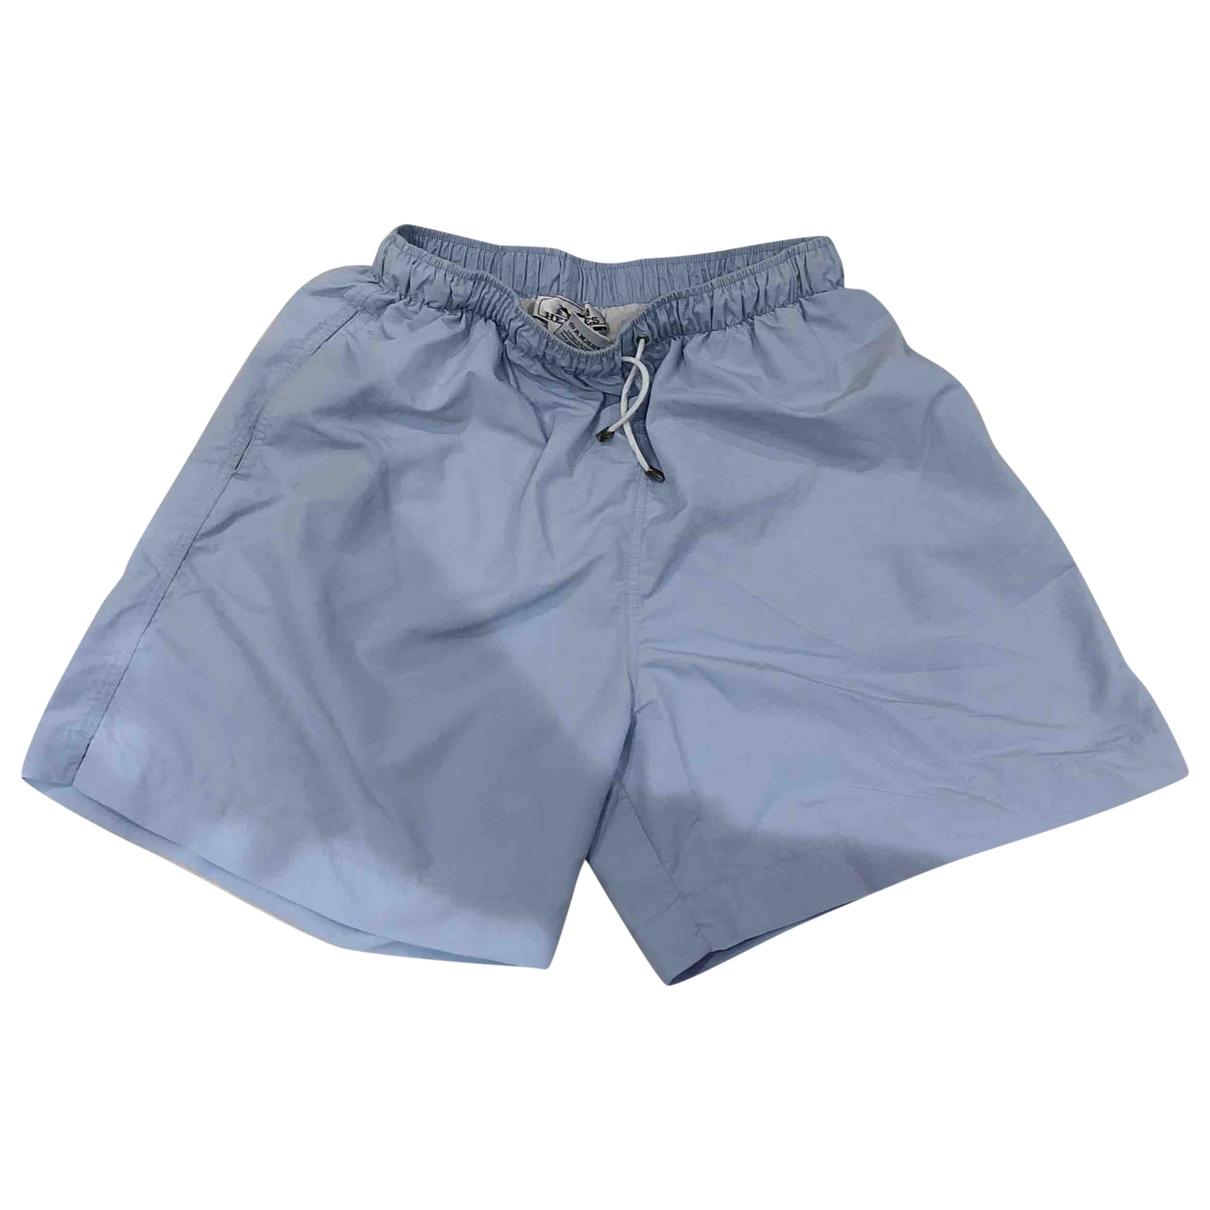 Hermès \N Blue Cotton - elasthane Swimwear for Men M International